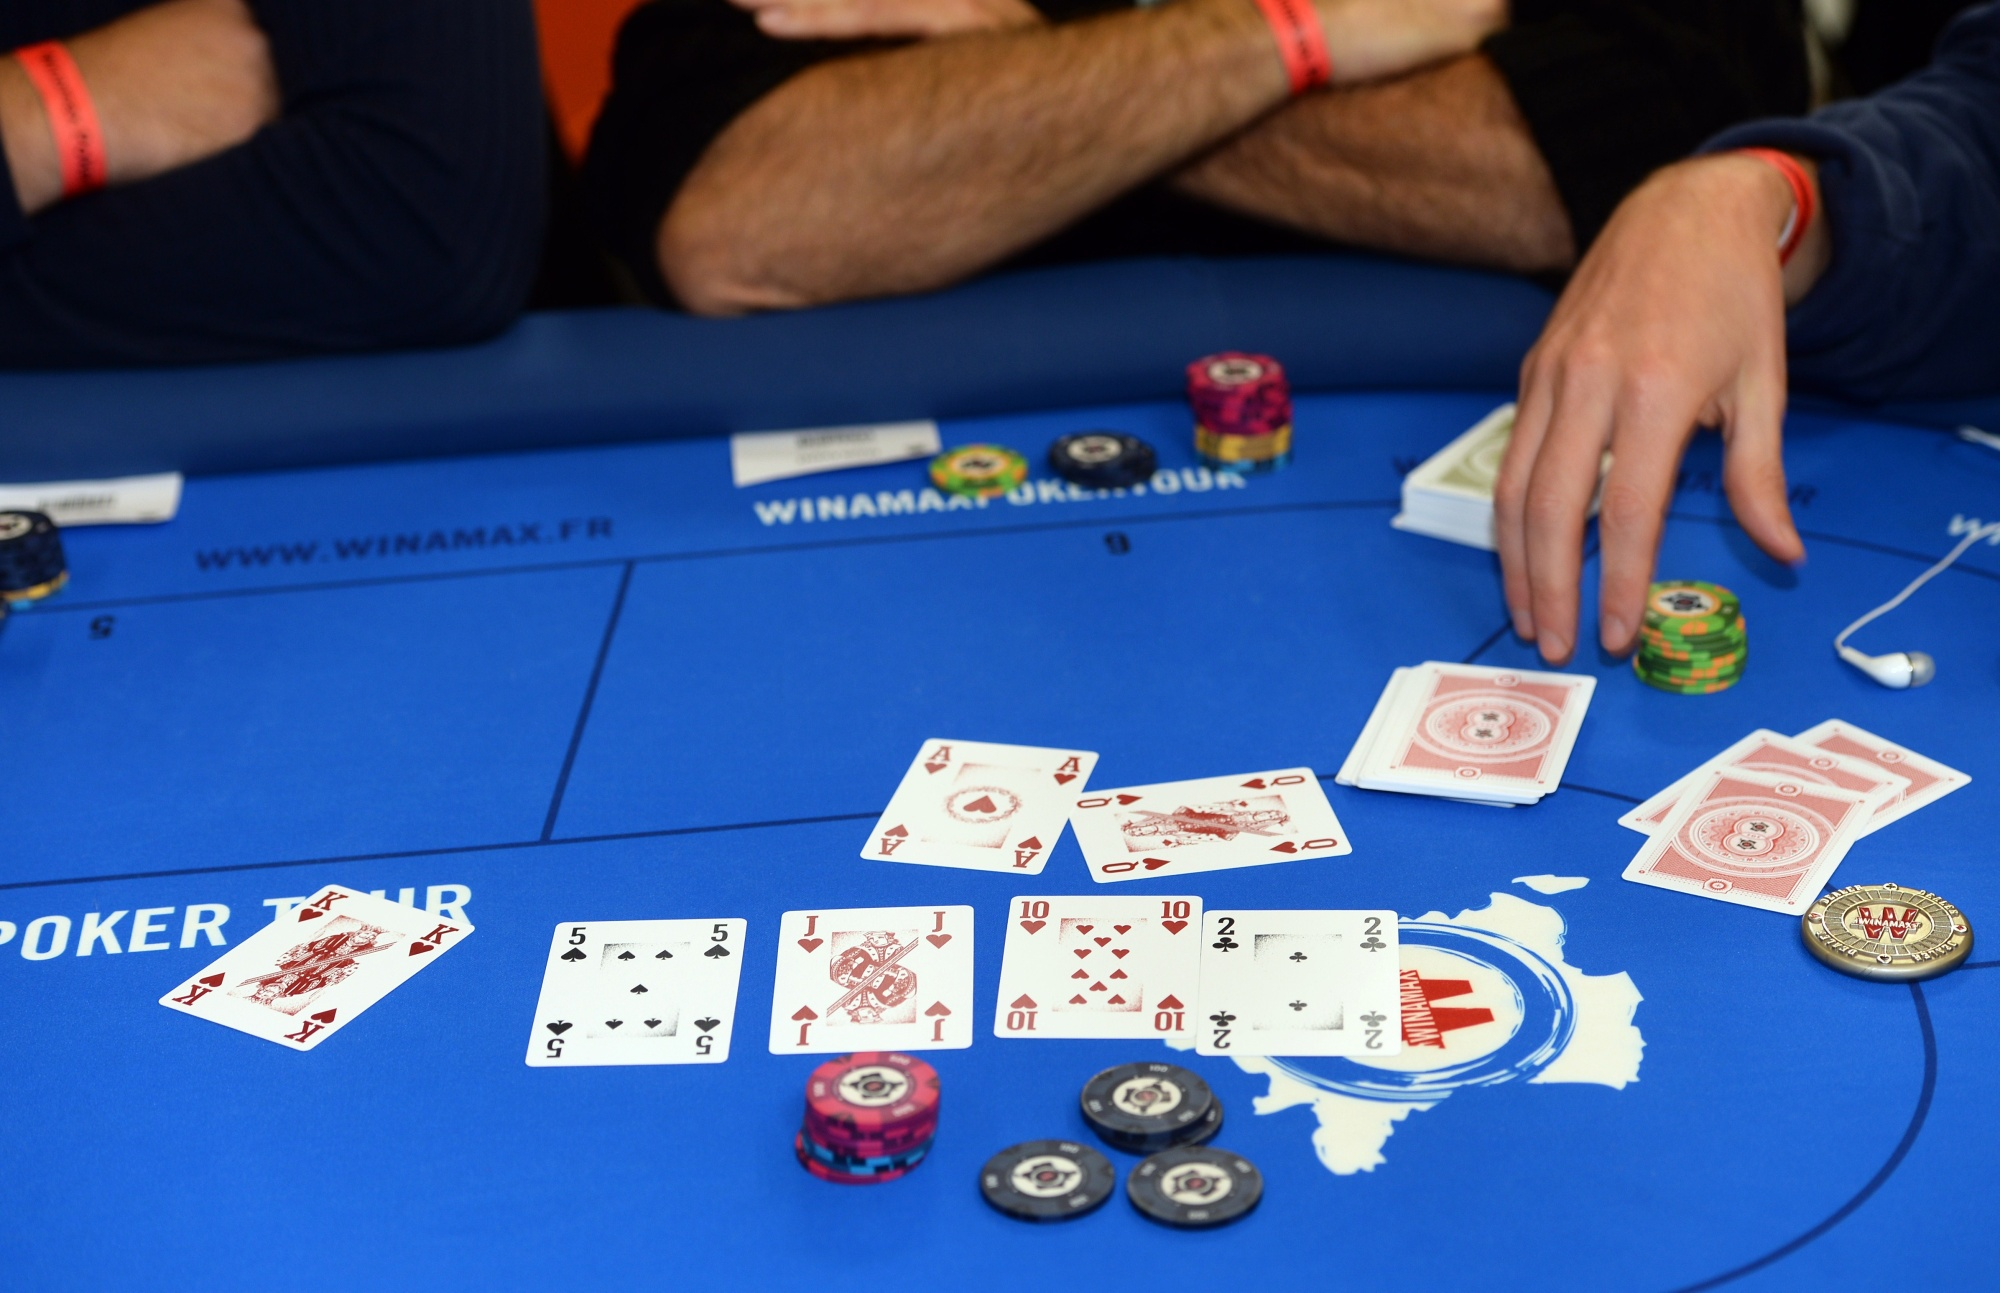 Poker Skills Can Make Investing Less Like Gambling - Bloomberg